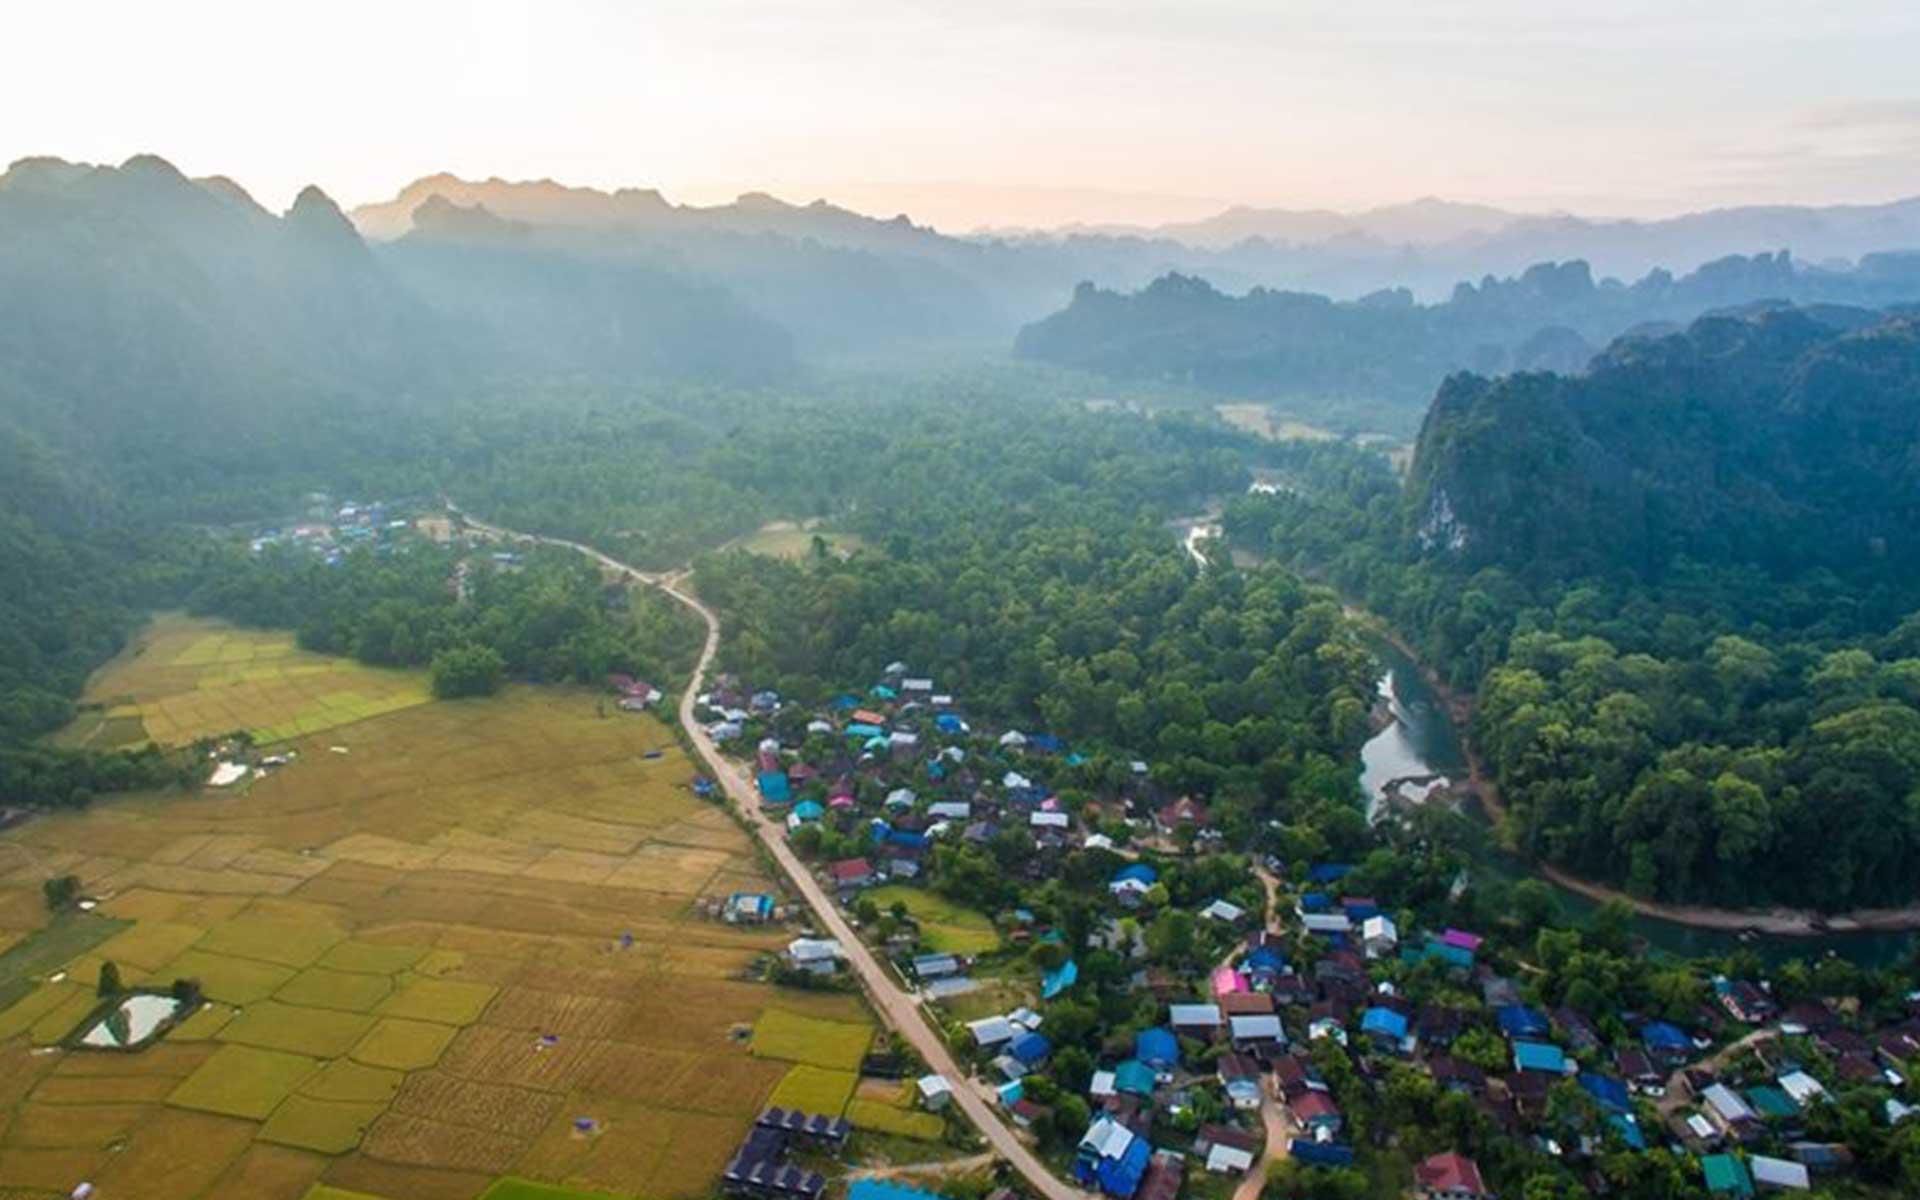 LAOS Laotravel 20 Laos Travel